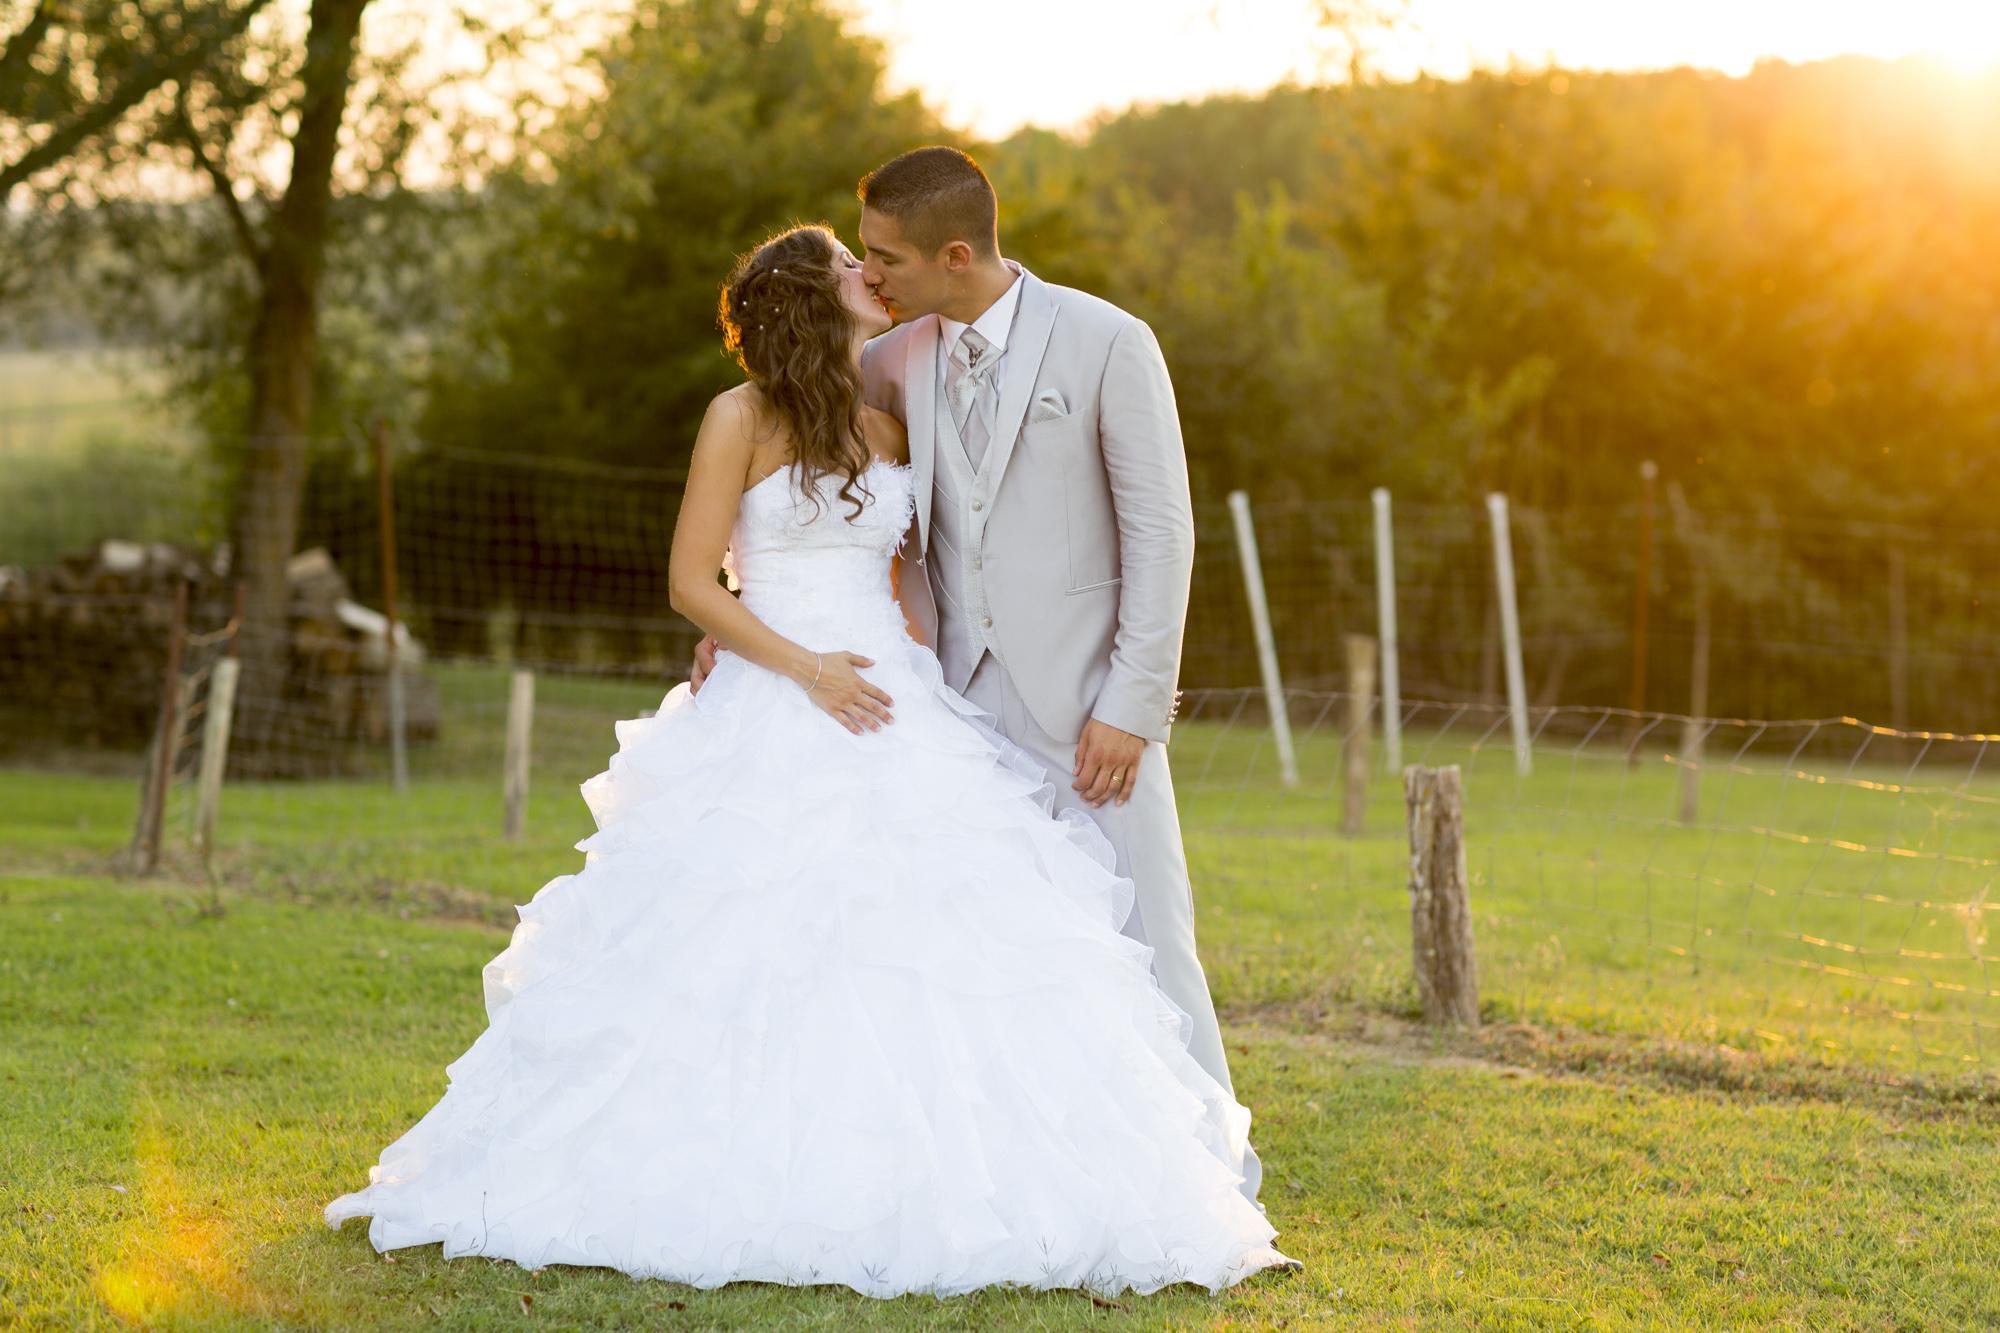 Photographe de mariage bordeaux sebastien huruguen - Photo de mariage ...